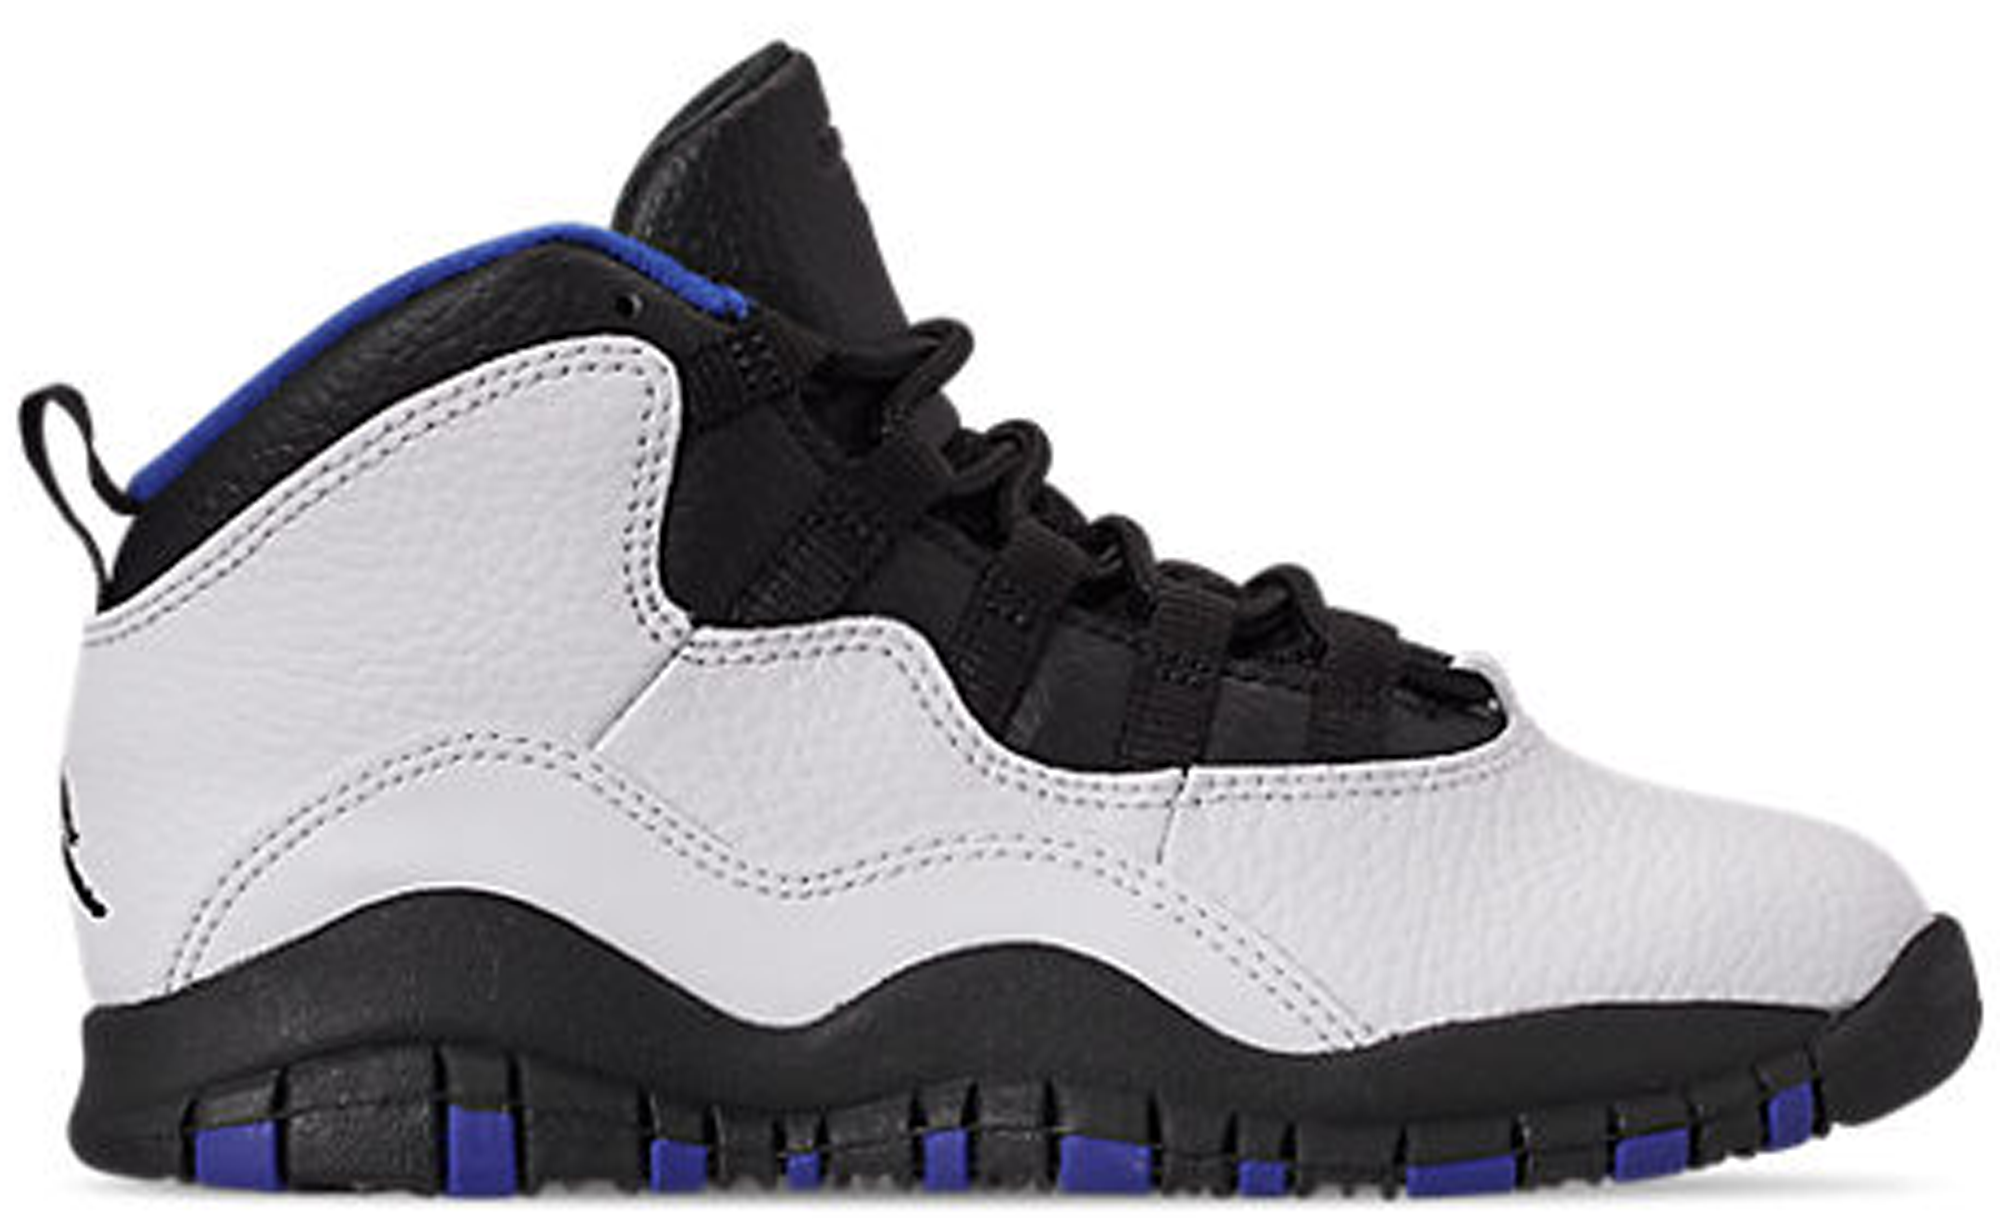 Jordan 10 Retro Orlando (PS) - 310807-108